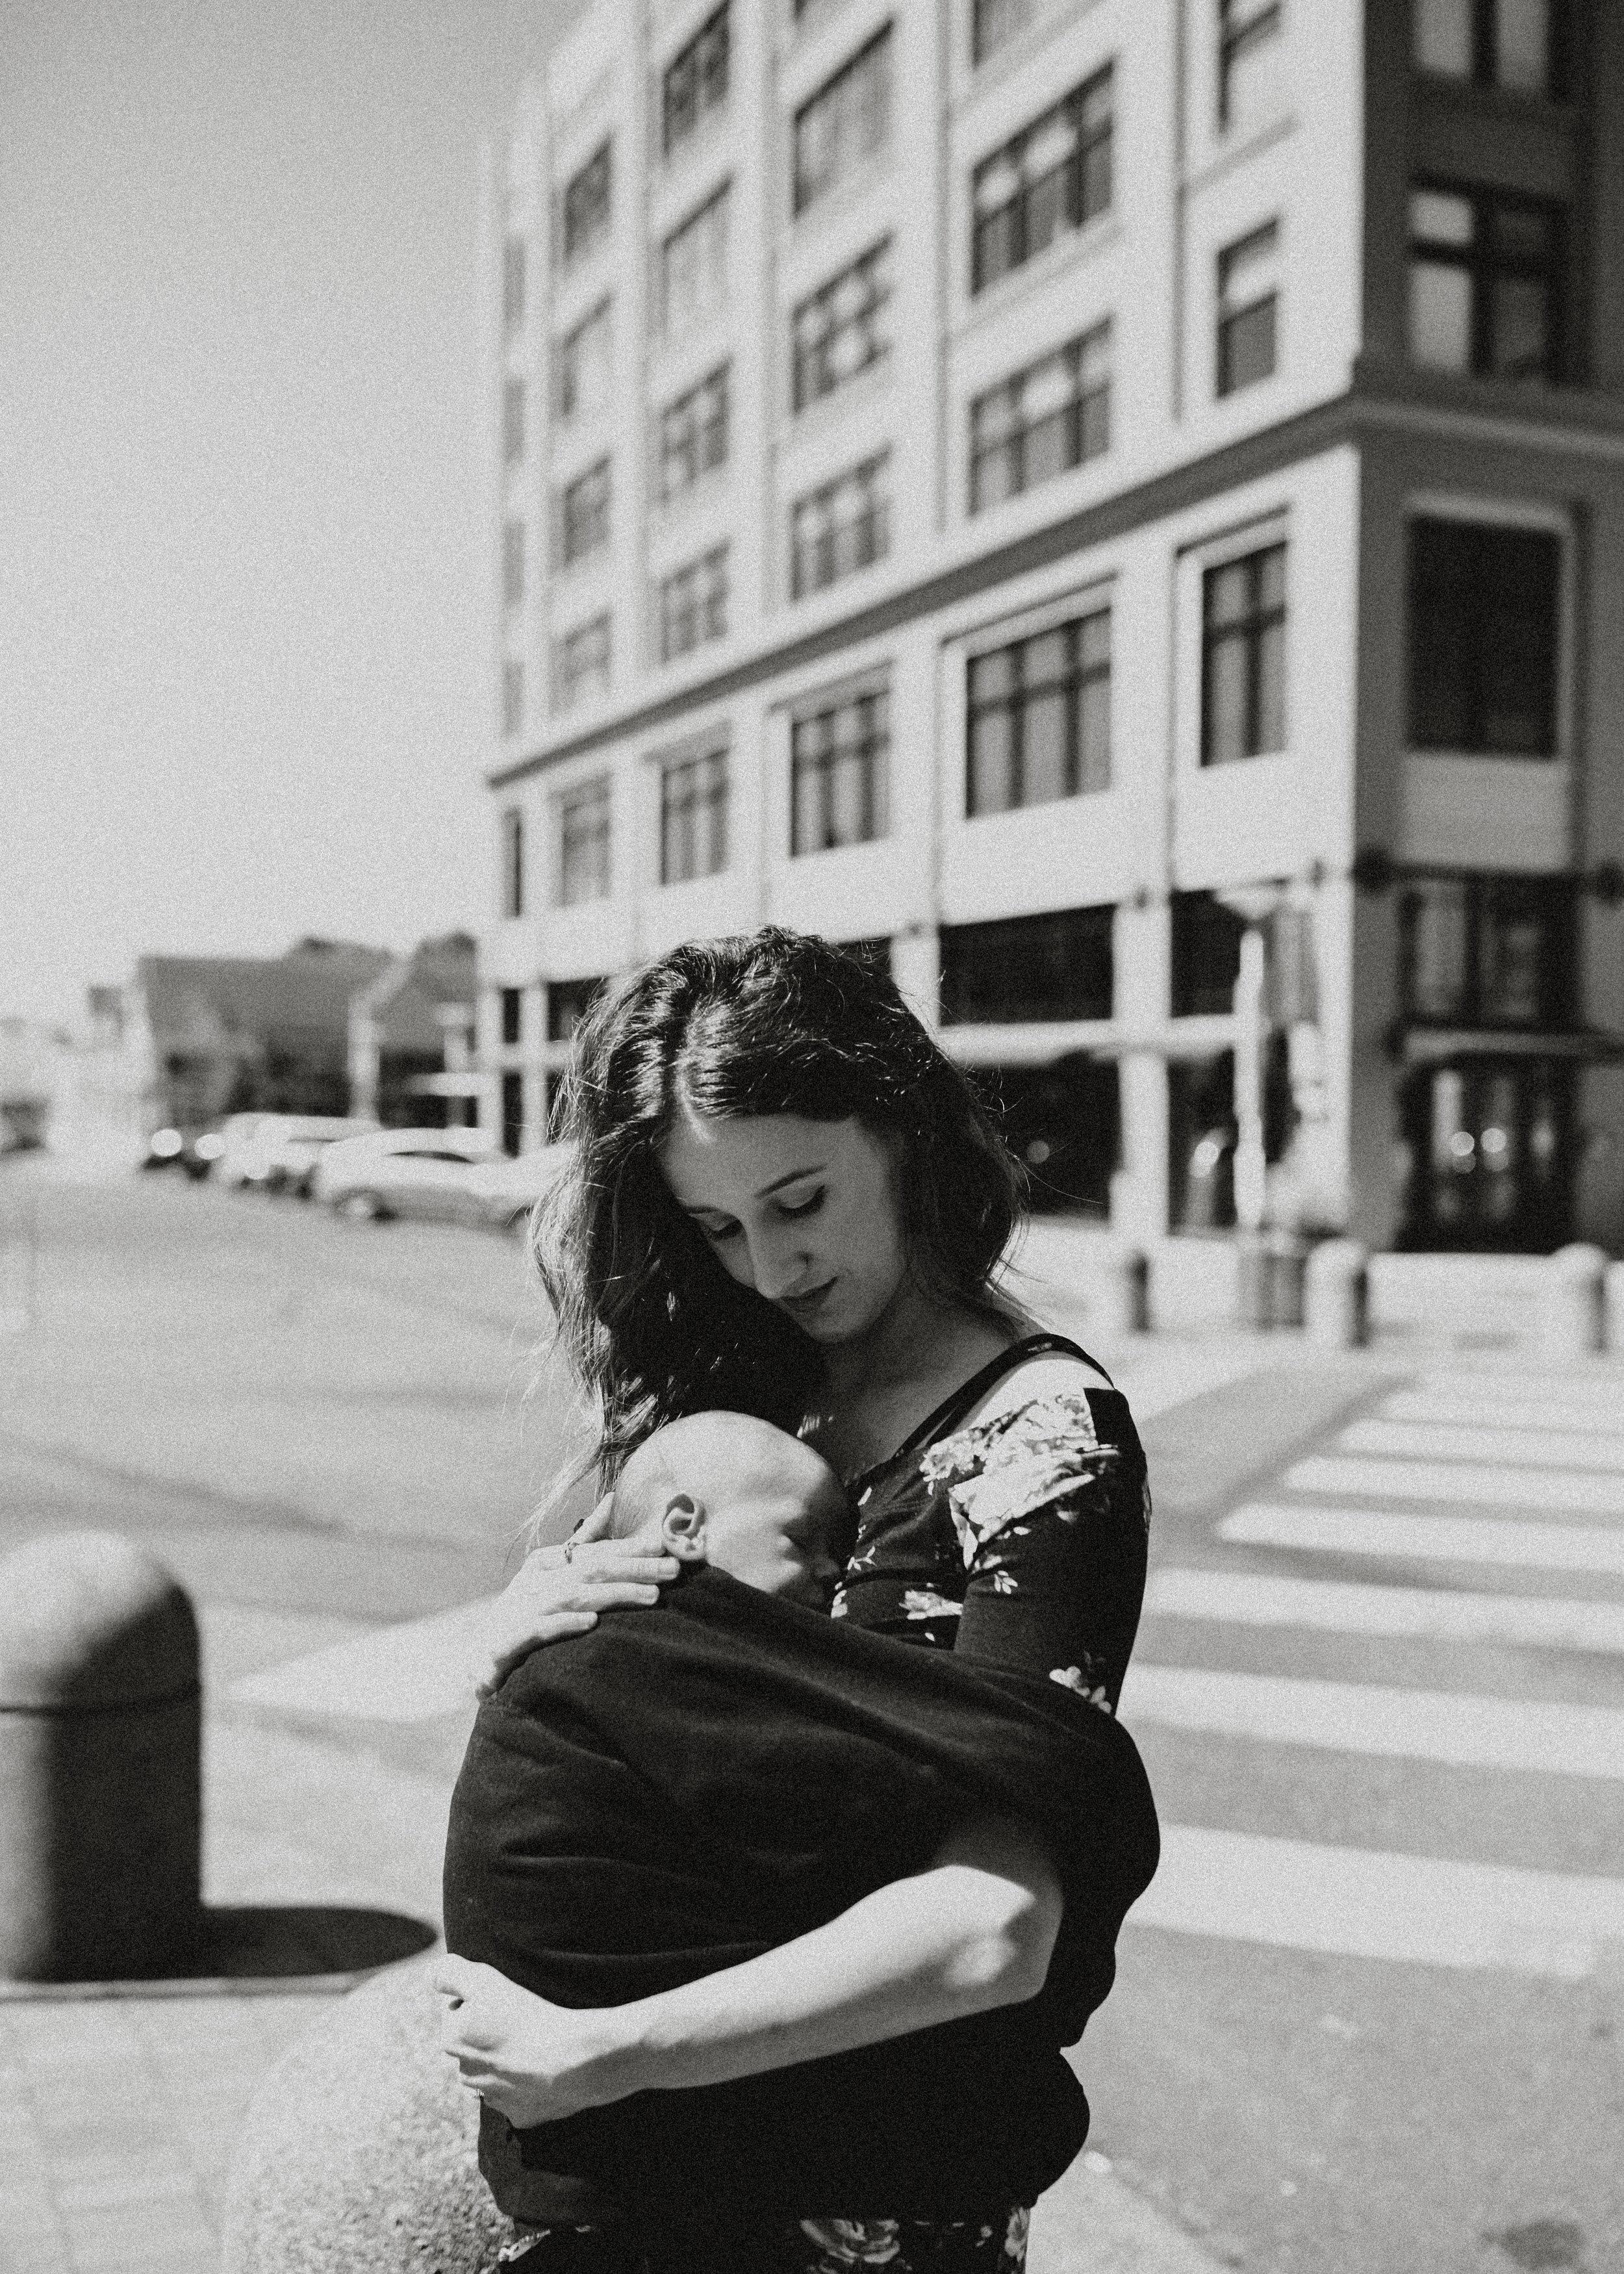 Family-Photographer-Bellingham-WA-Brianne-Bell-Photography-(Jessica)-35.jpg